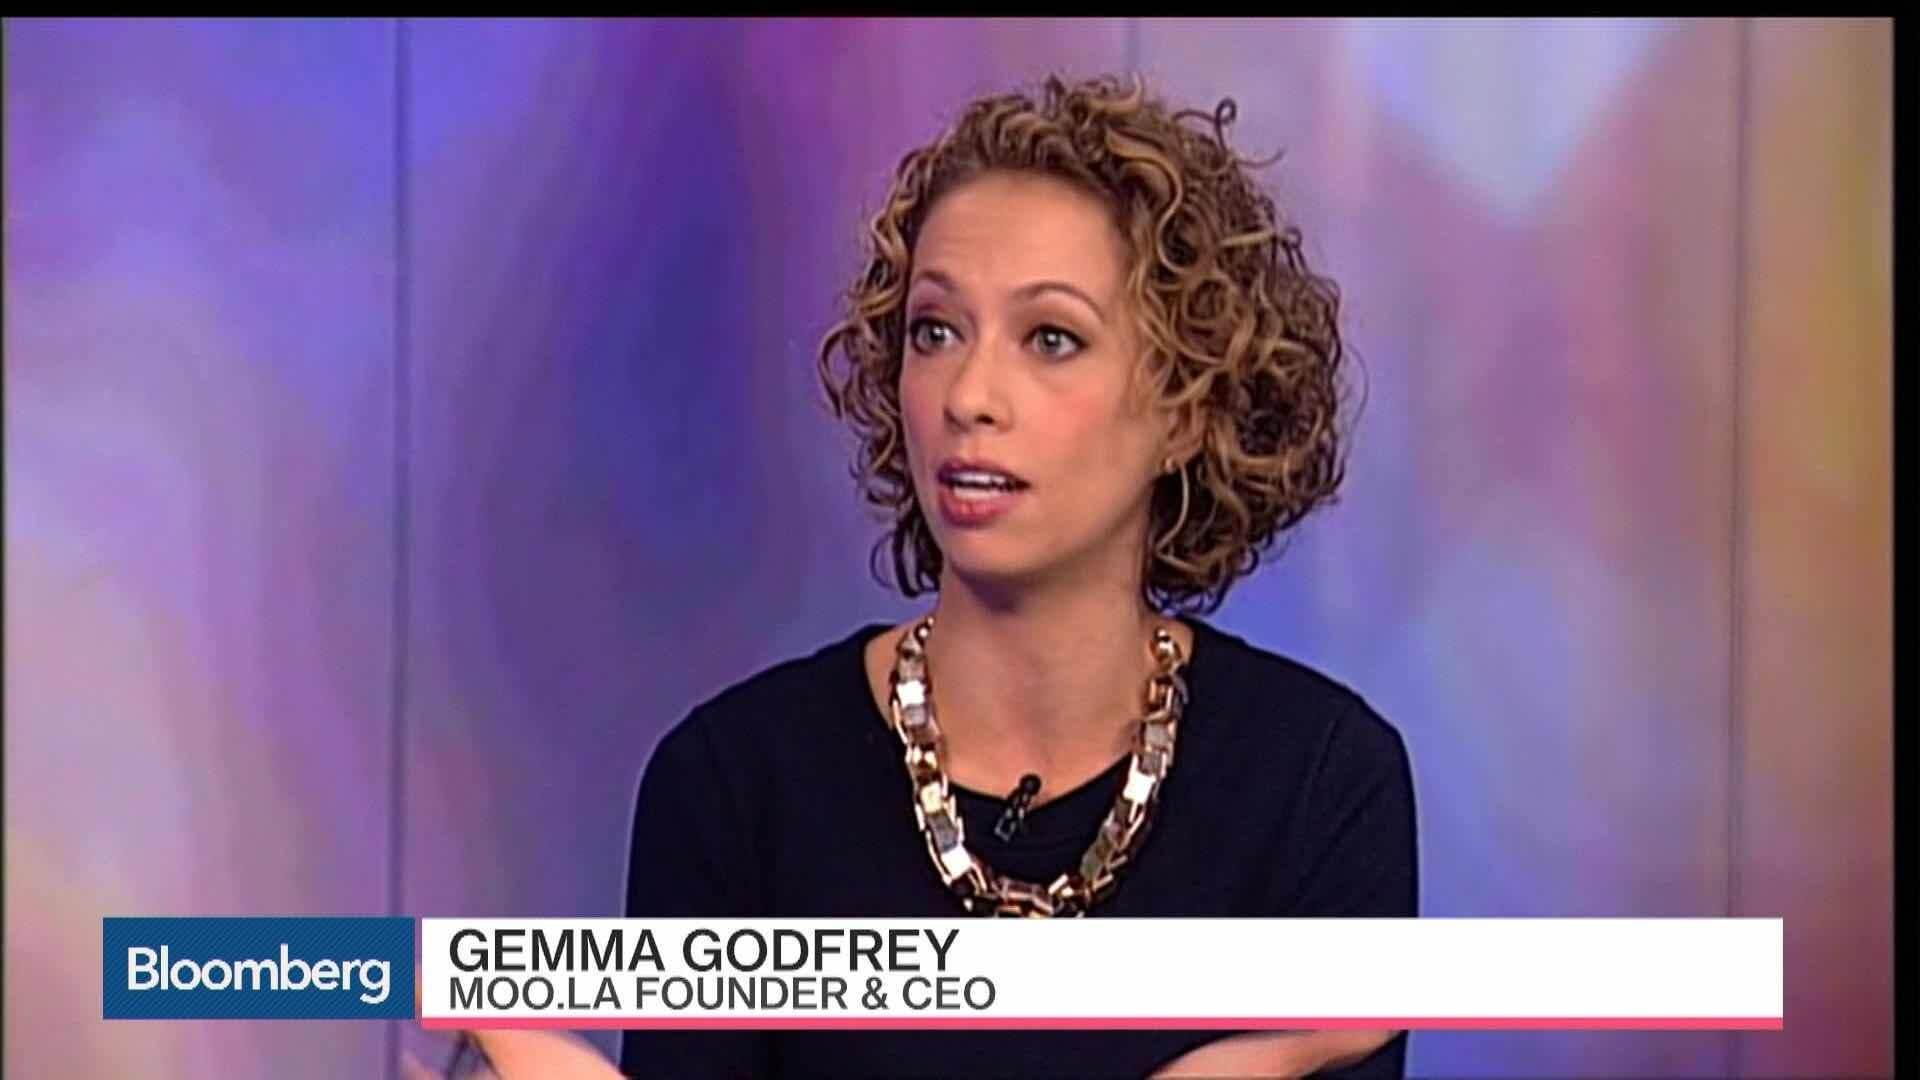 Gemma Godfrey femtech moo.la